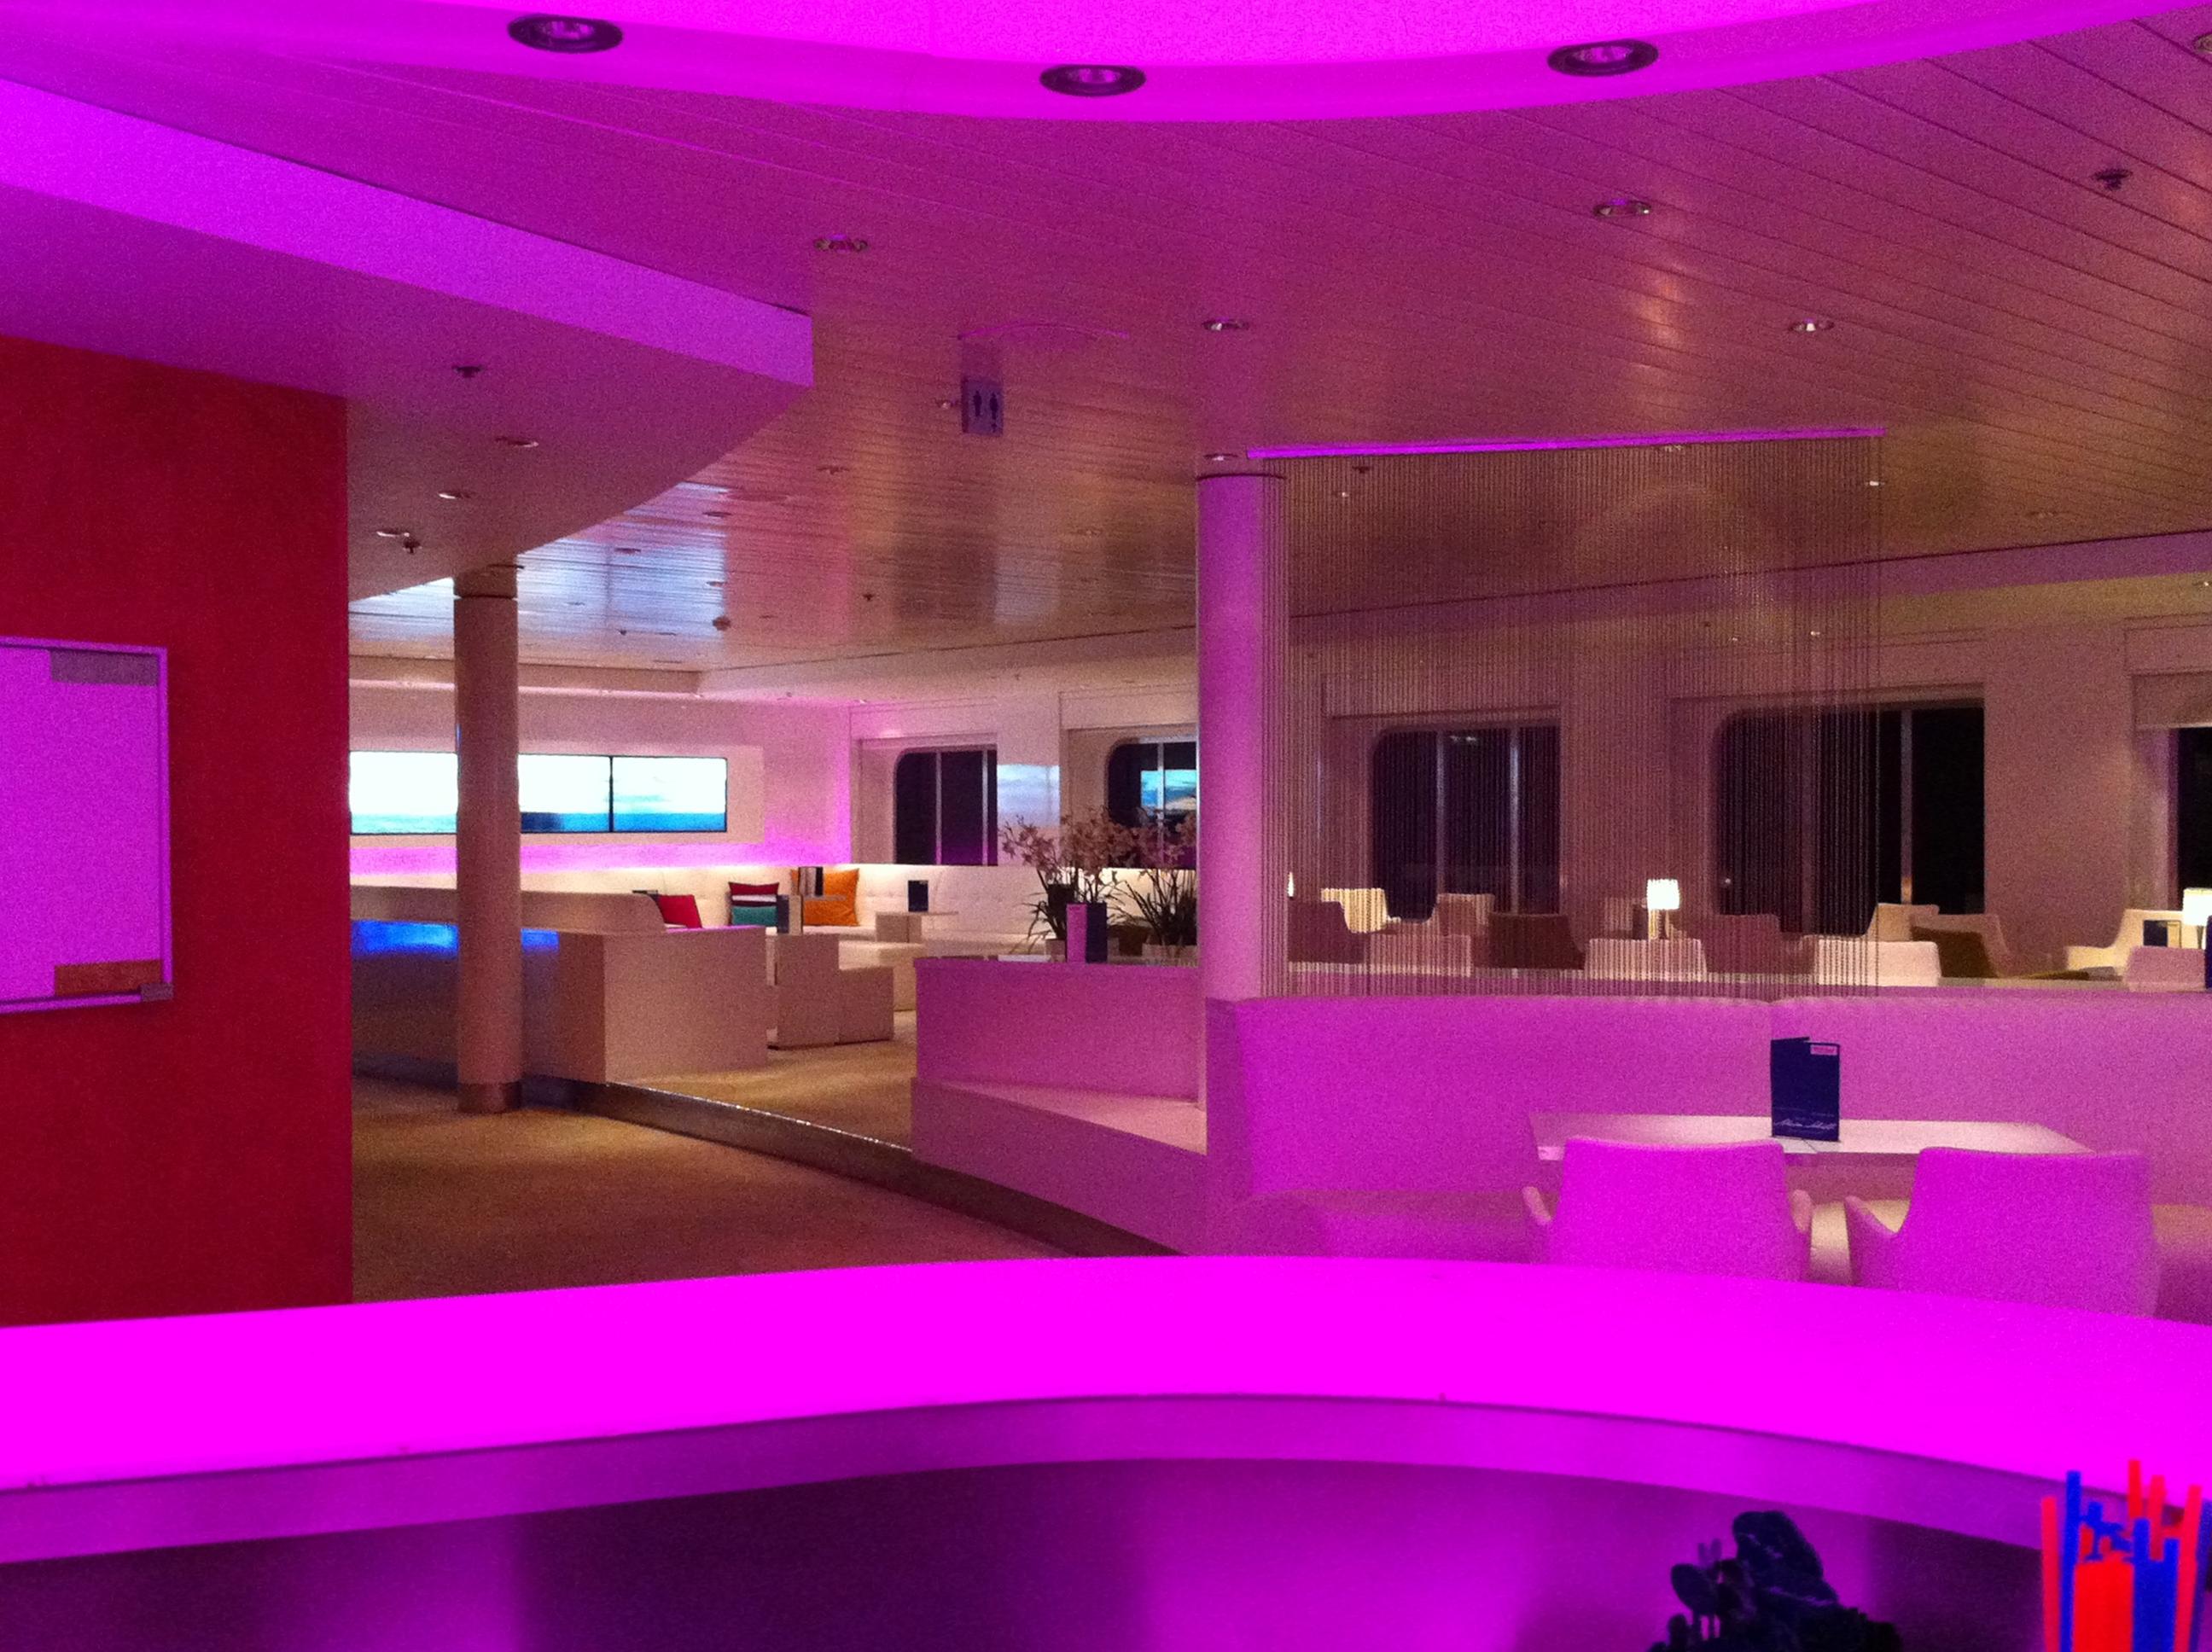 2010-12-15_MeinSchiff1_TUI-Bar_%286%29.JPG